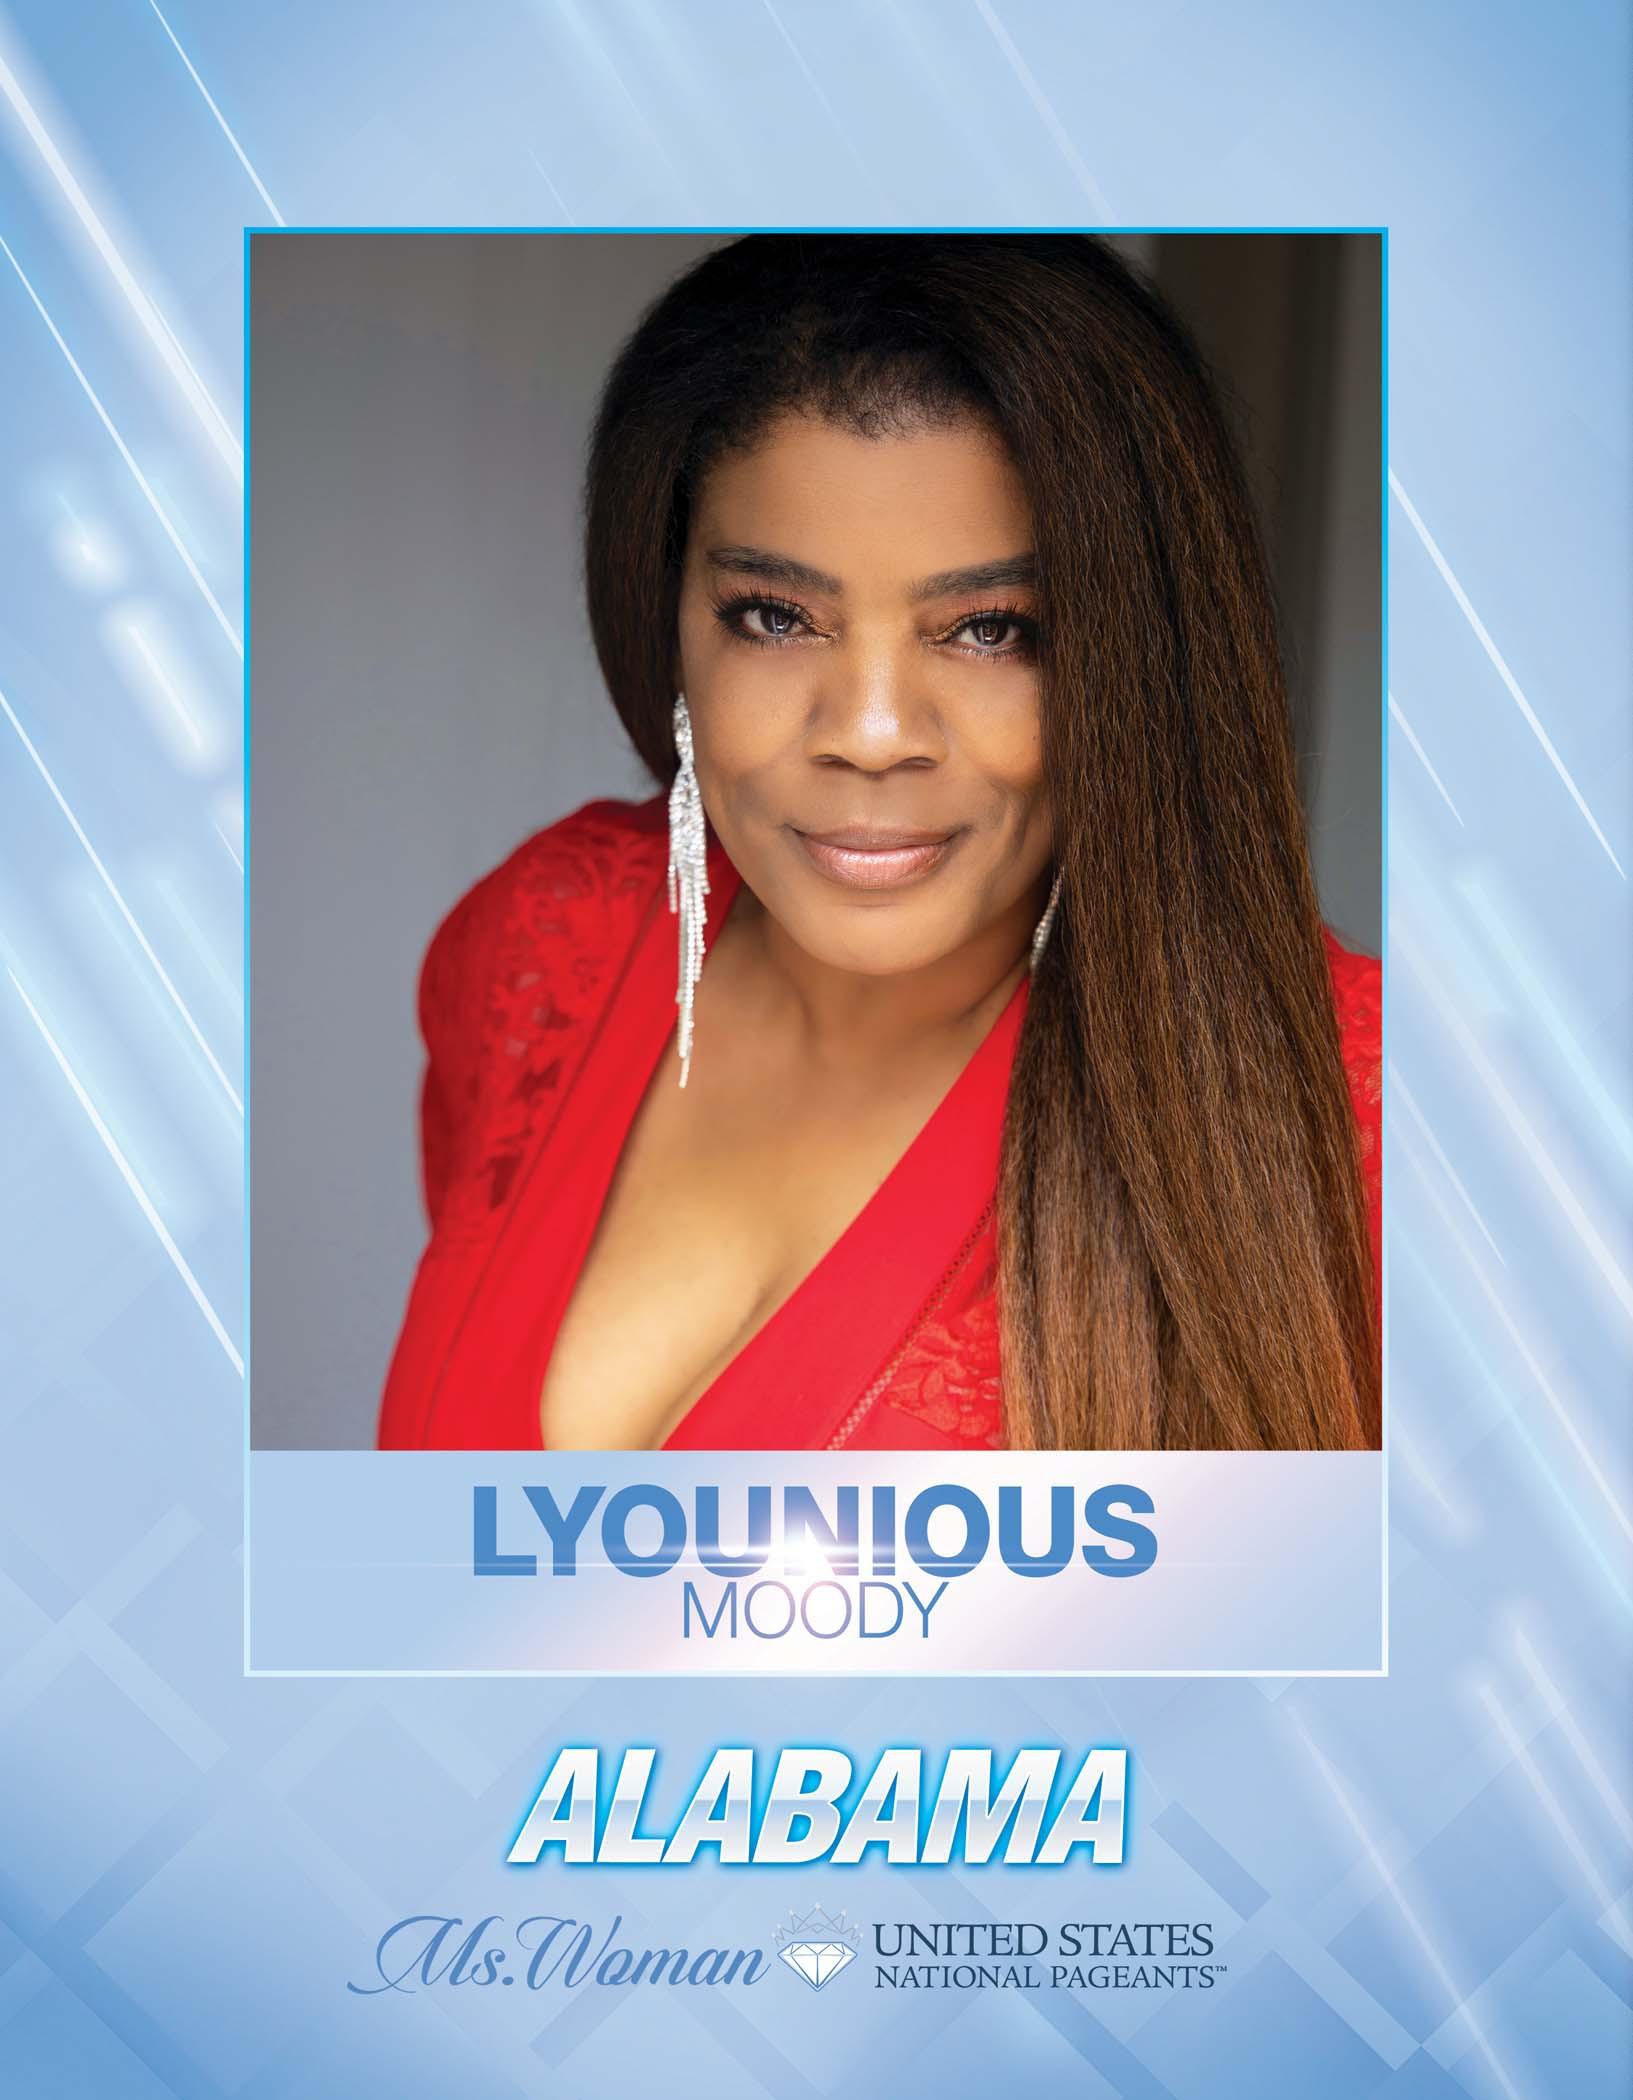 Lyounious Moody Ms. Woman Alabama United States - 2021